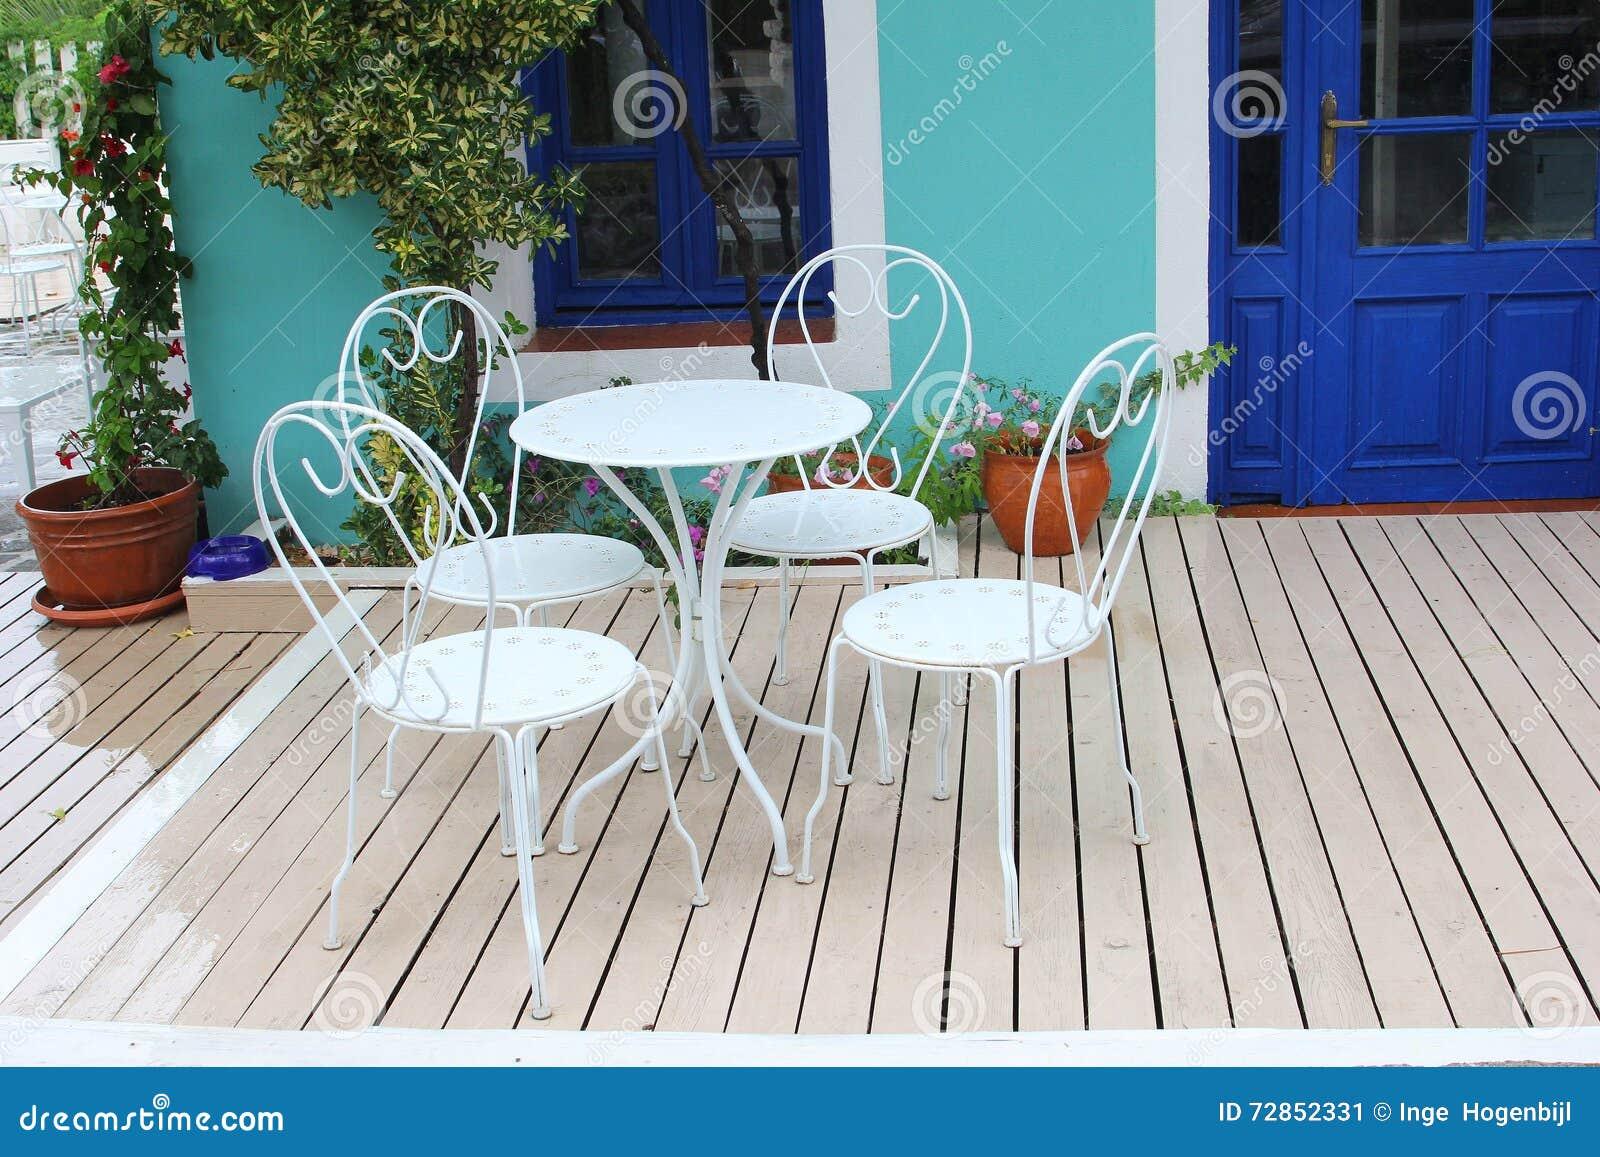 Garden patio with vintage style furniture wooden floor and flowerpots greece